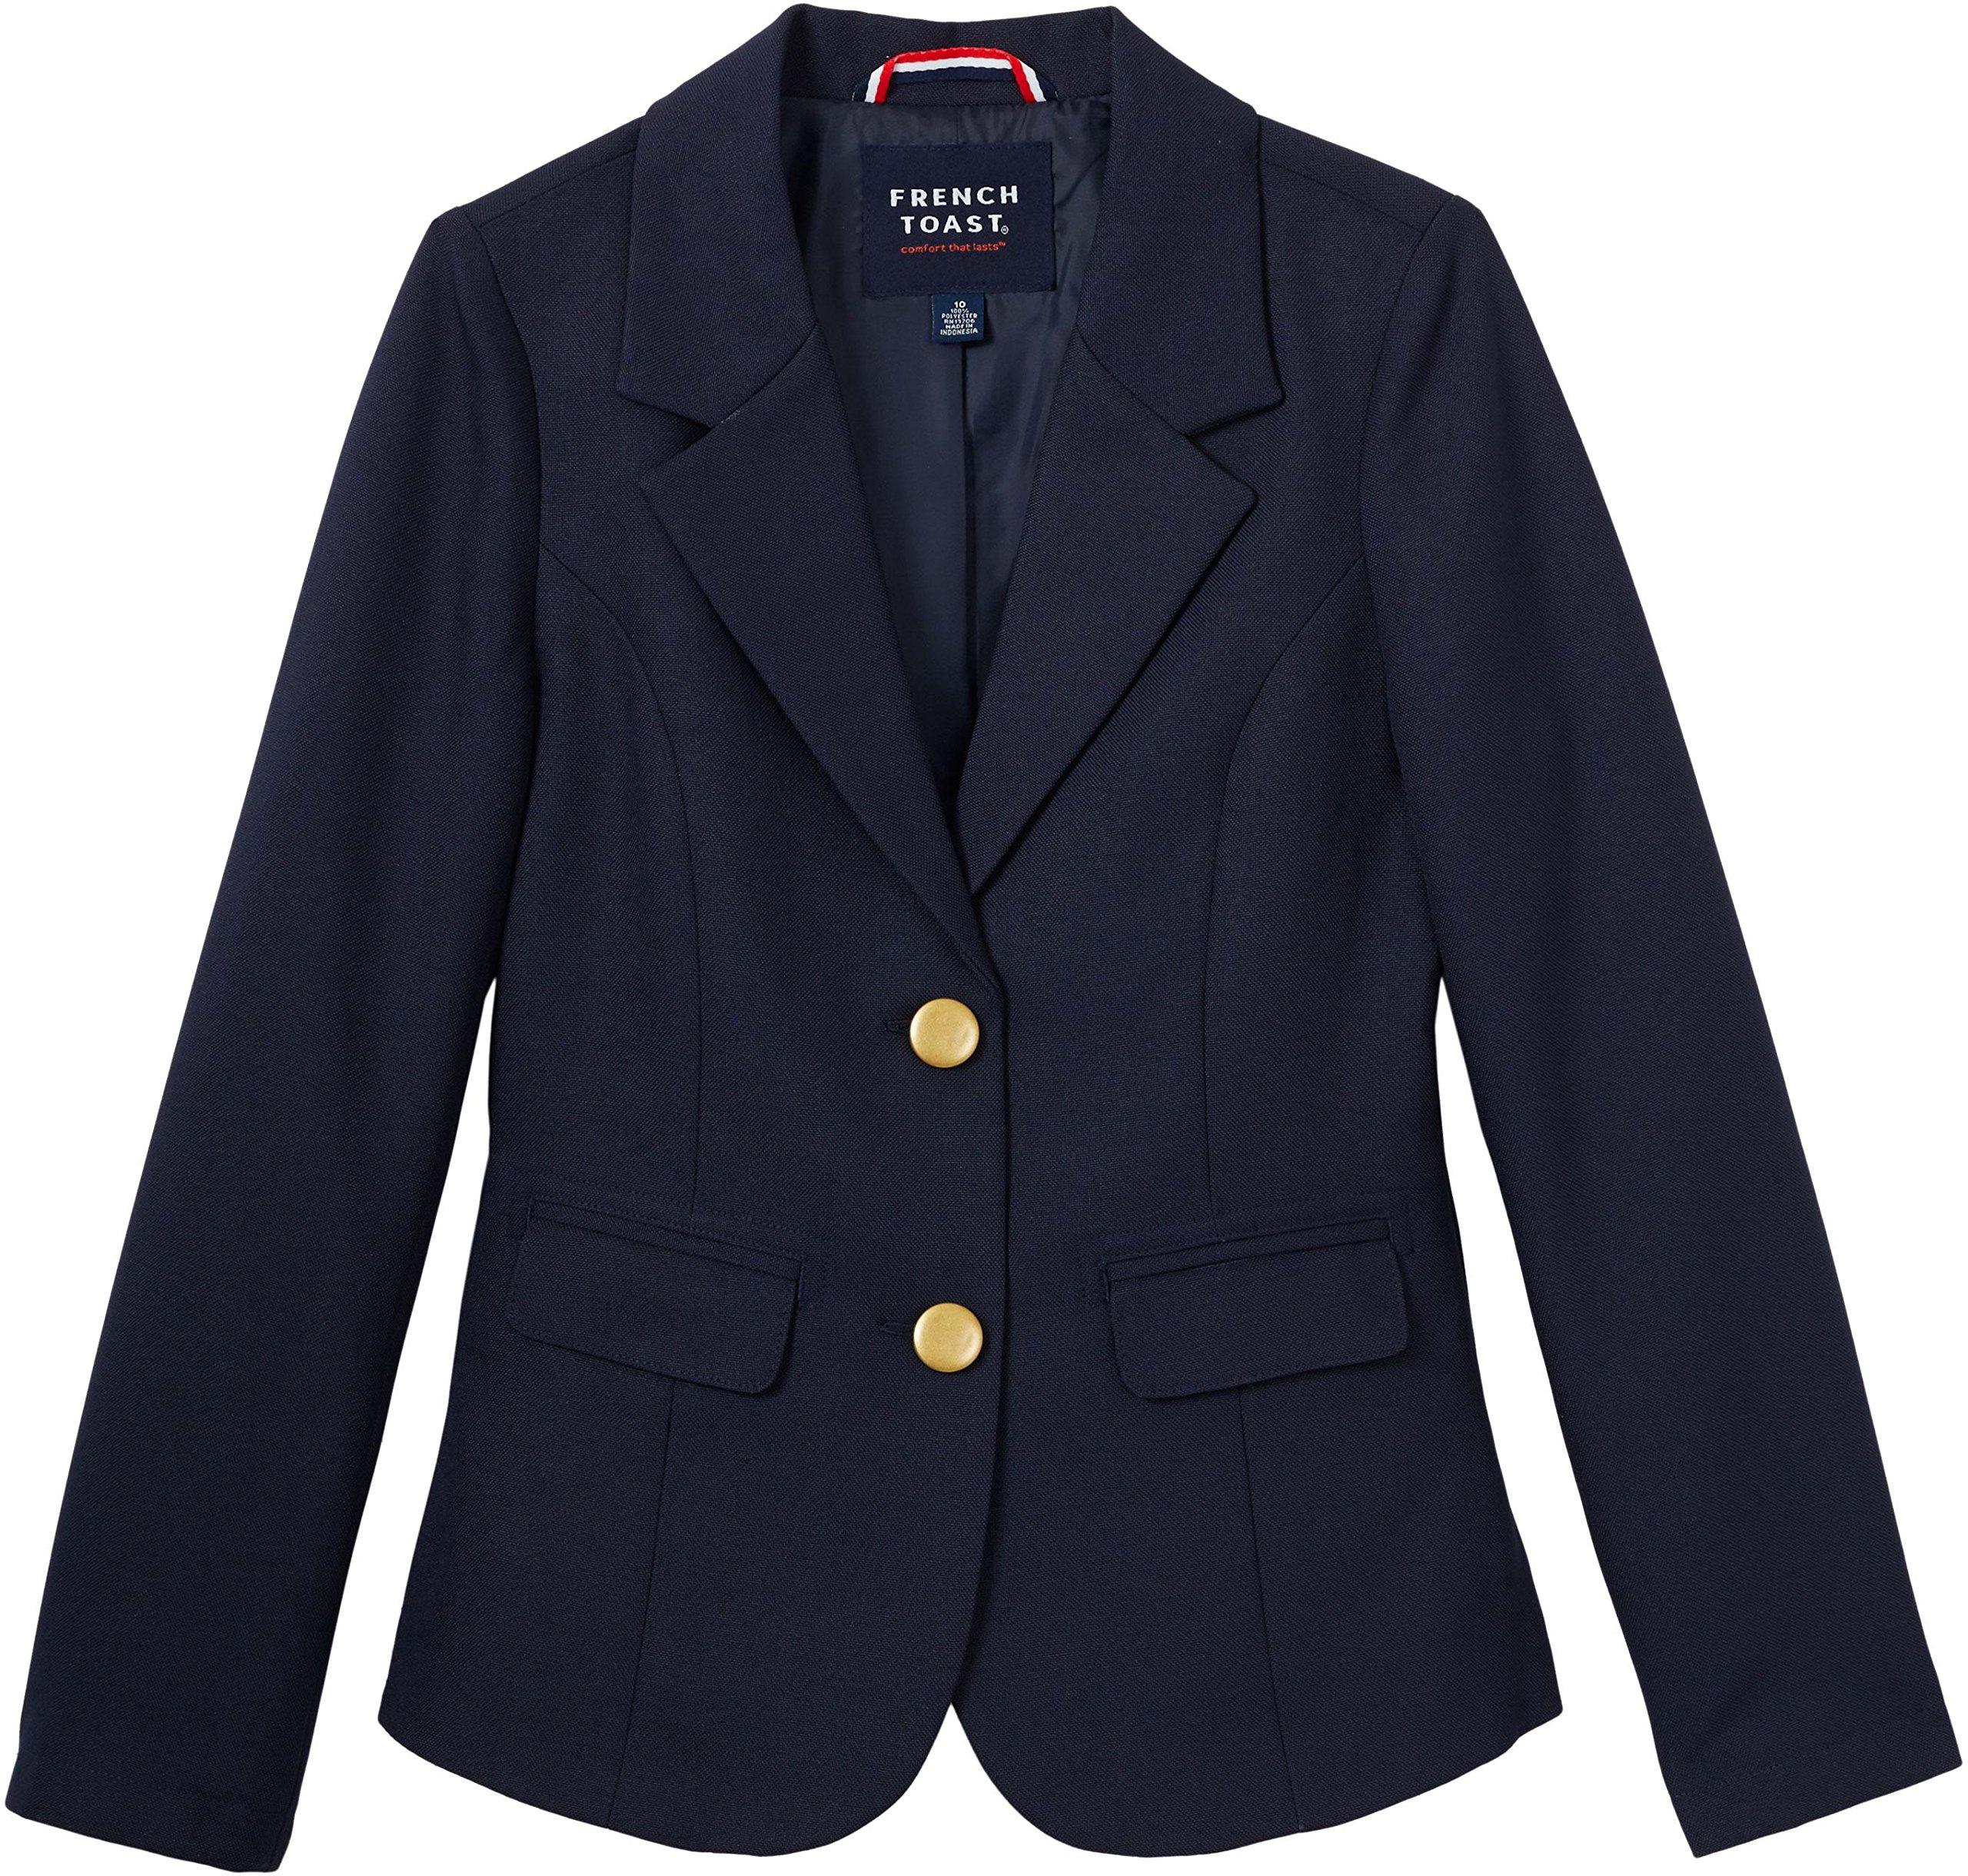 French Toast School Uniform Girls Classic School Blazer, Navy, 14 by French Toast